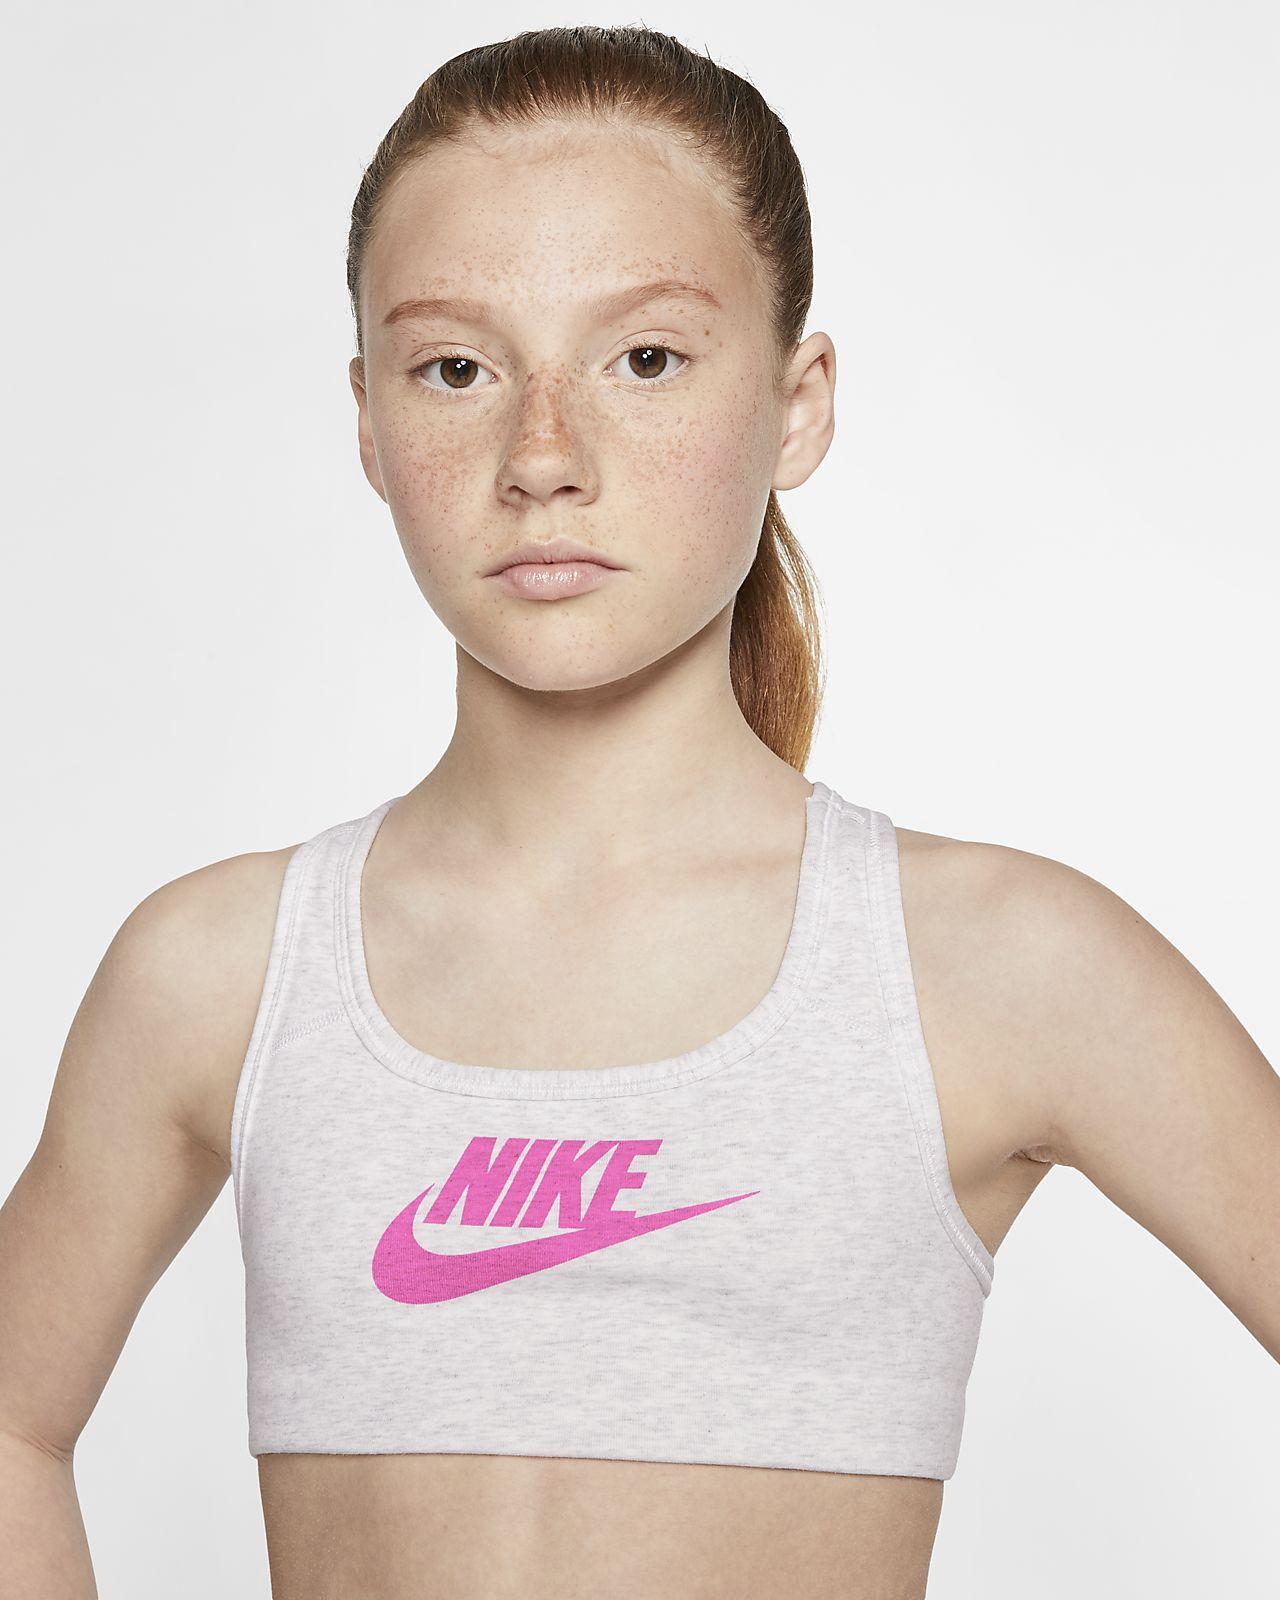 Nike Sportswear-hverdags-bh til piger